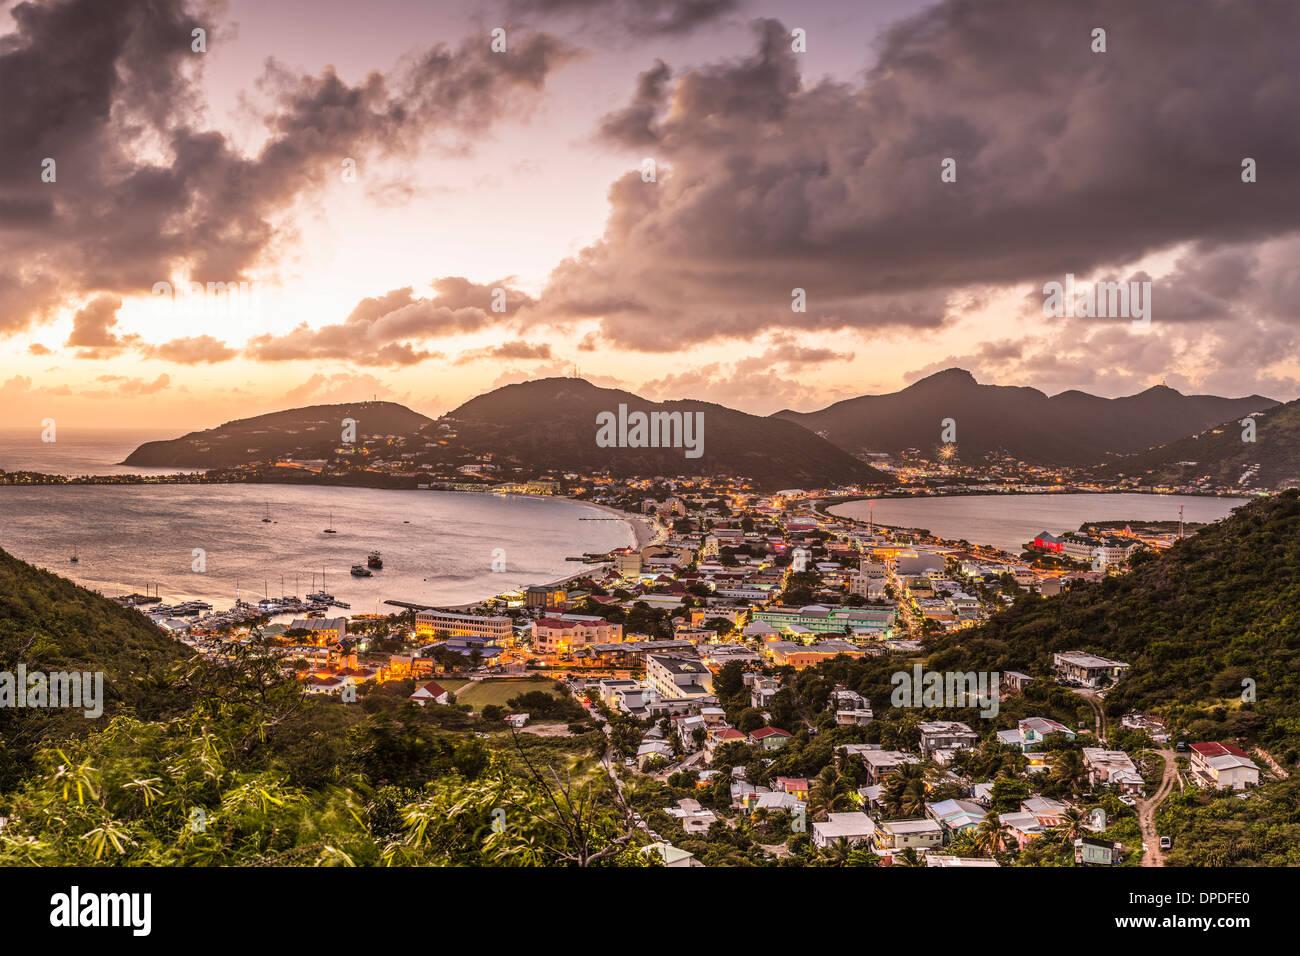 Philipsburg, Saint Martin dans les Caraïbes. Photo Stock